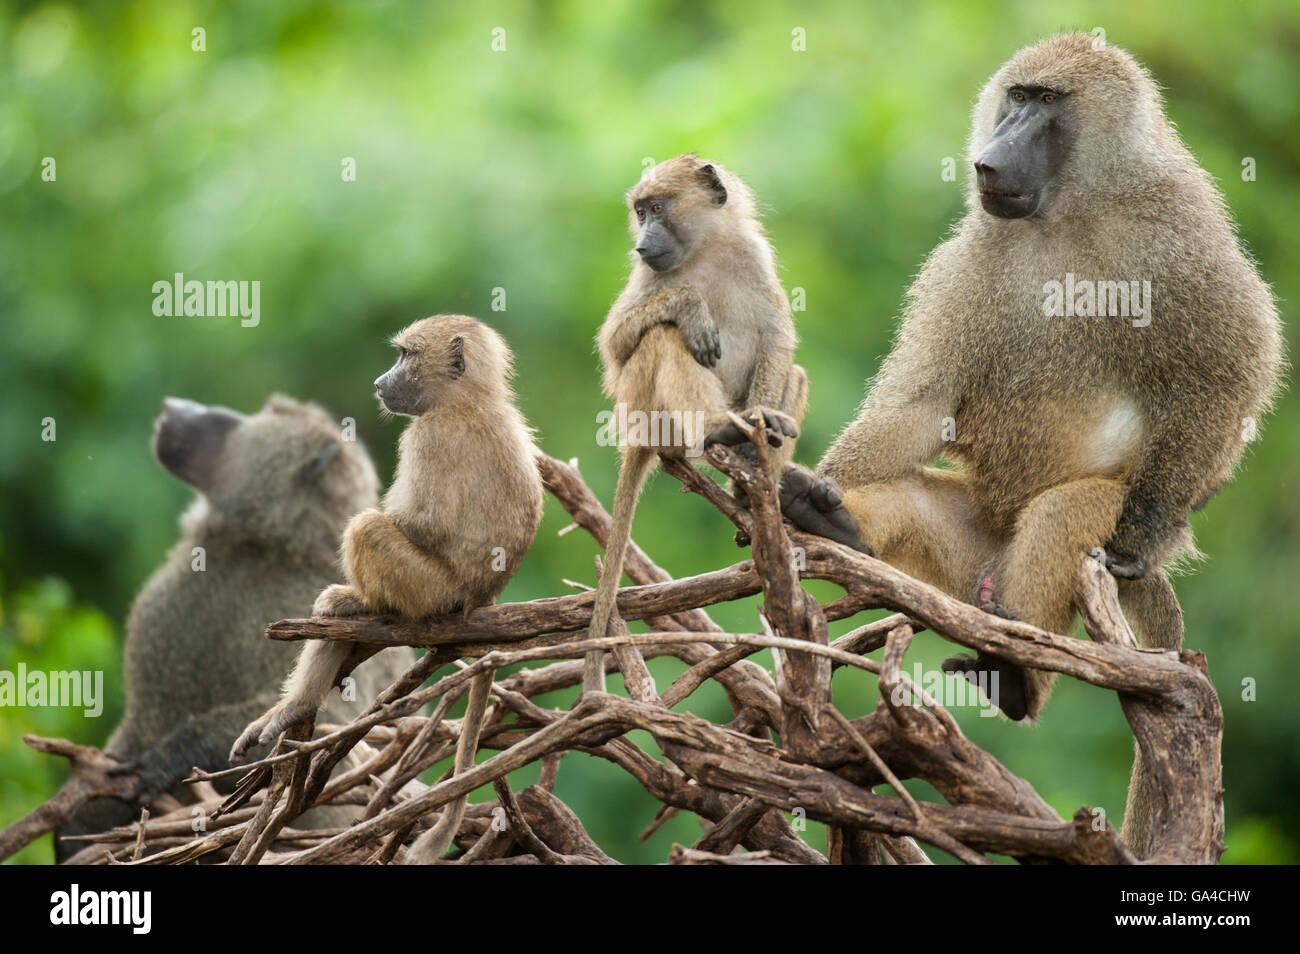 Olive baboons ( Papio cynocephalus anubis), Lake Manyara National Park, Tanzania - Stock Image